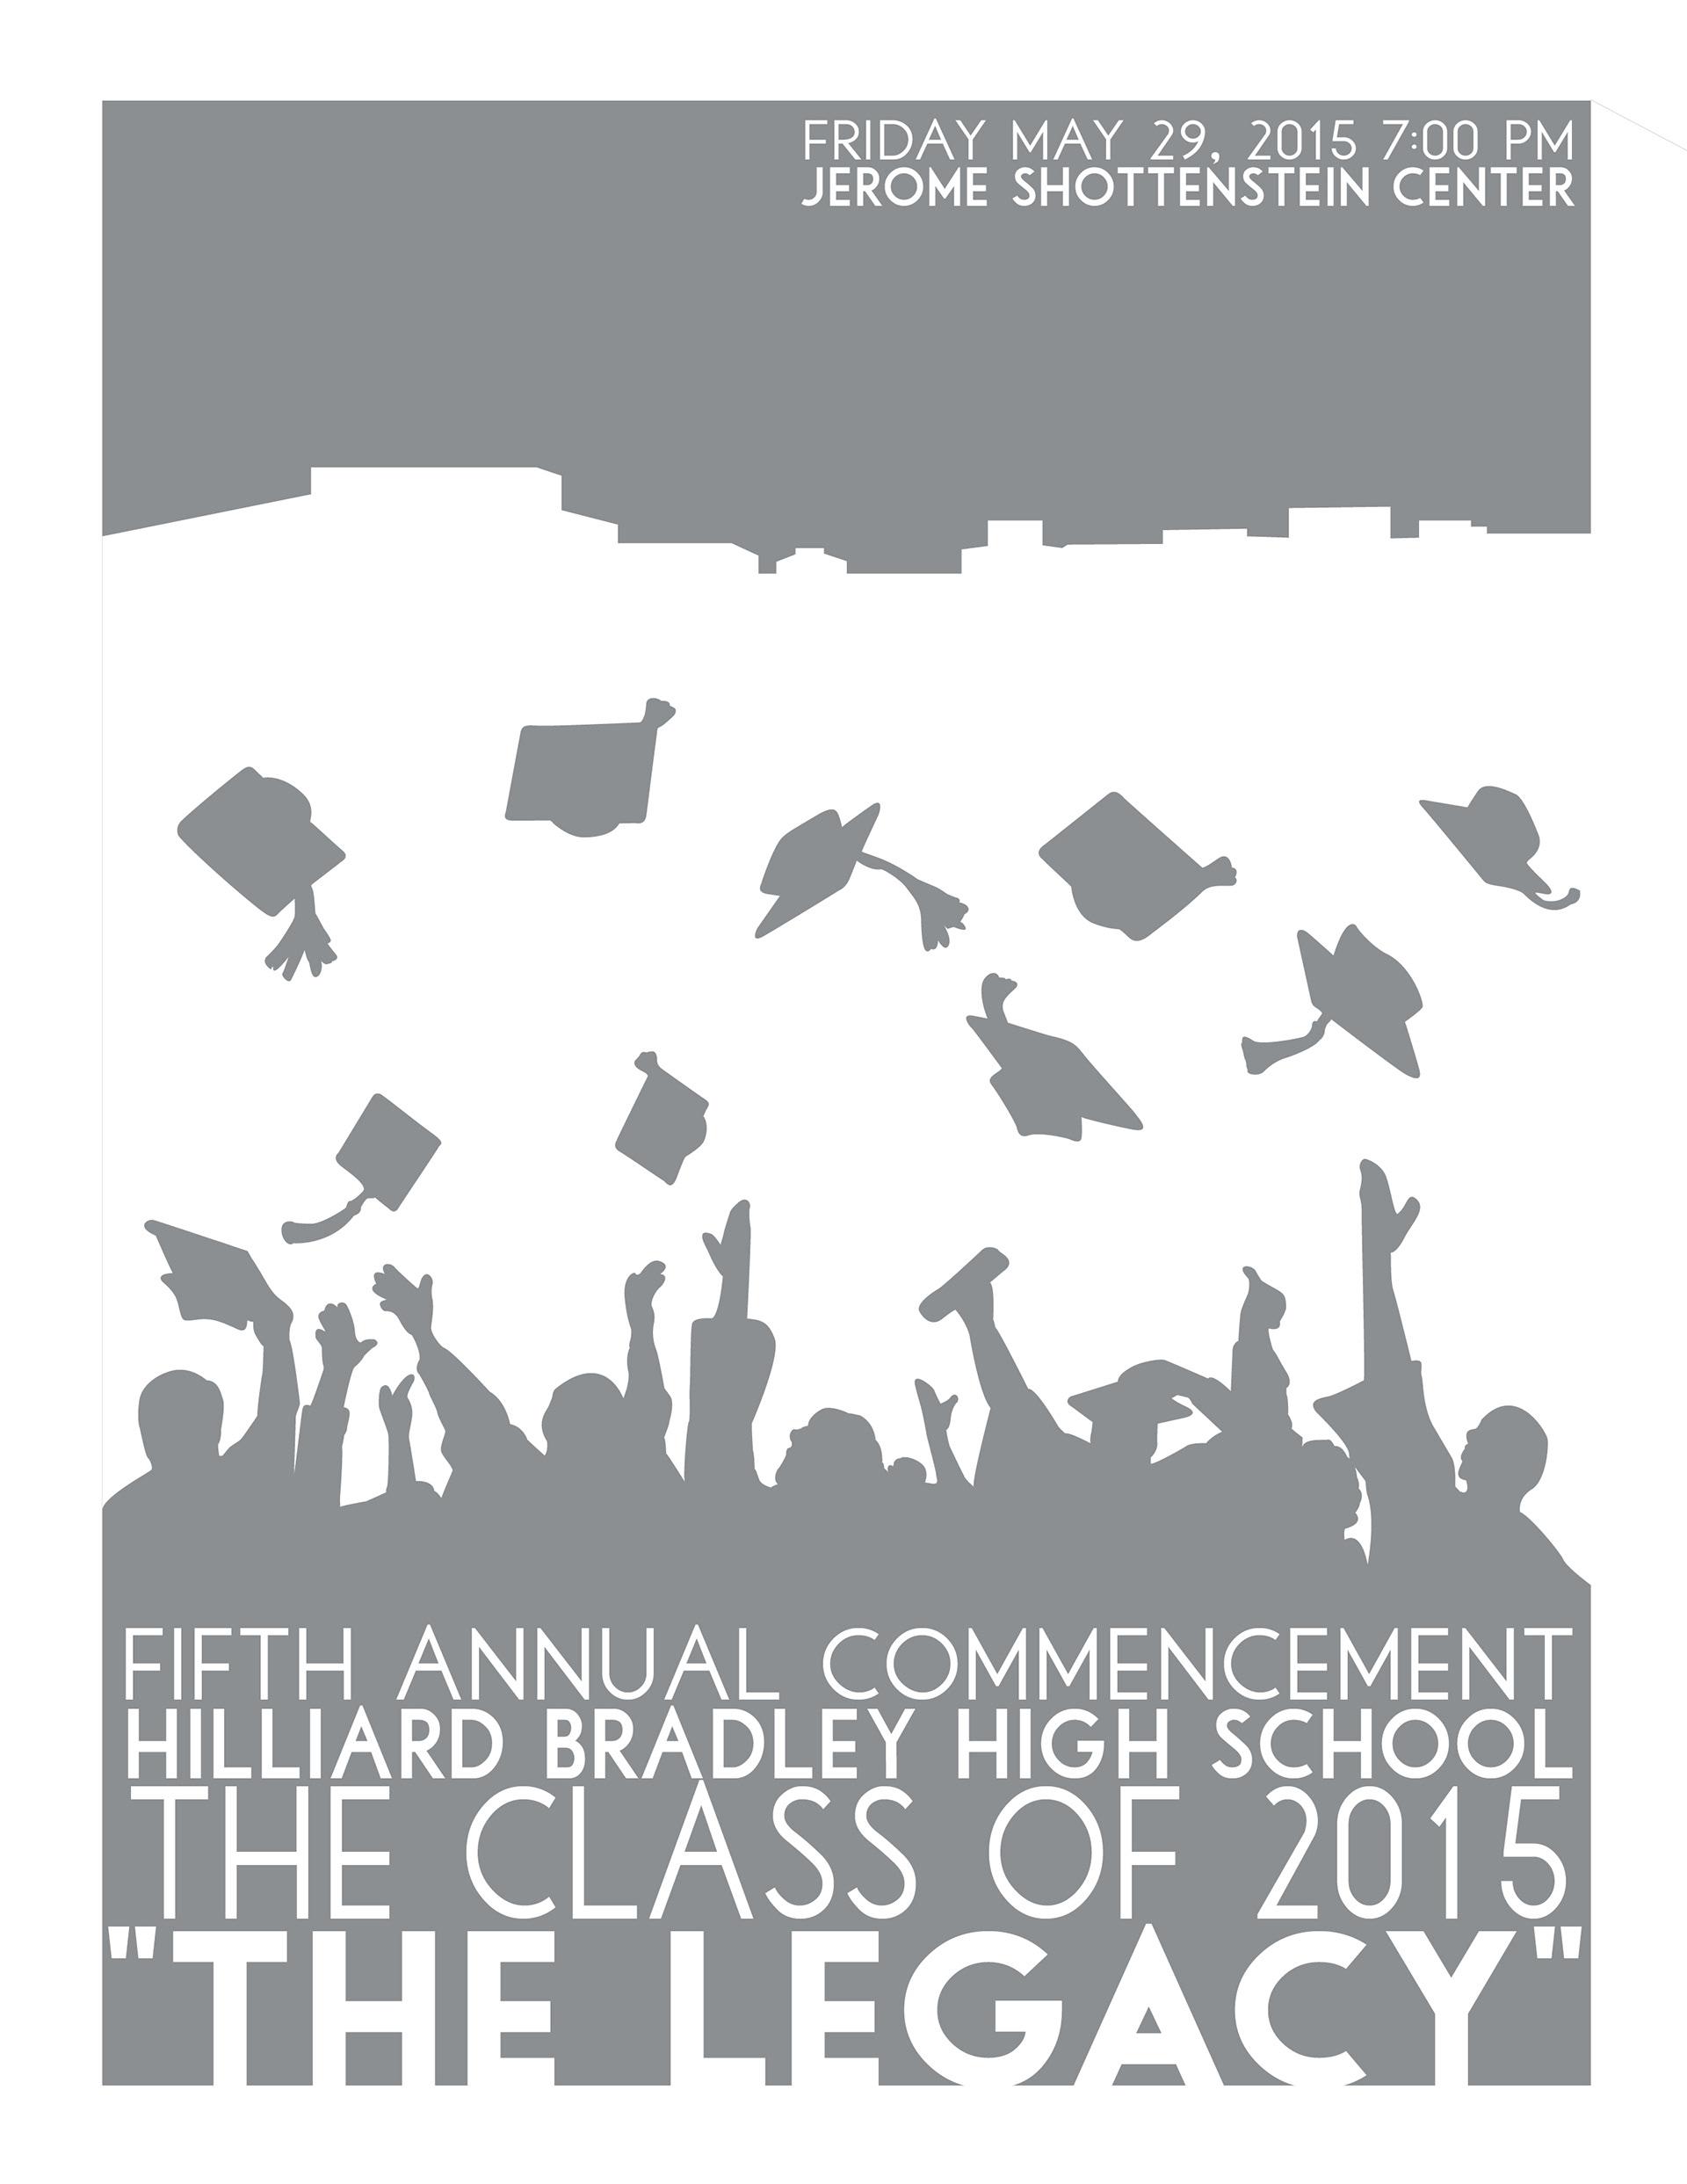 high school graduation program covers - Etame.mibawa.co